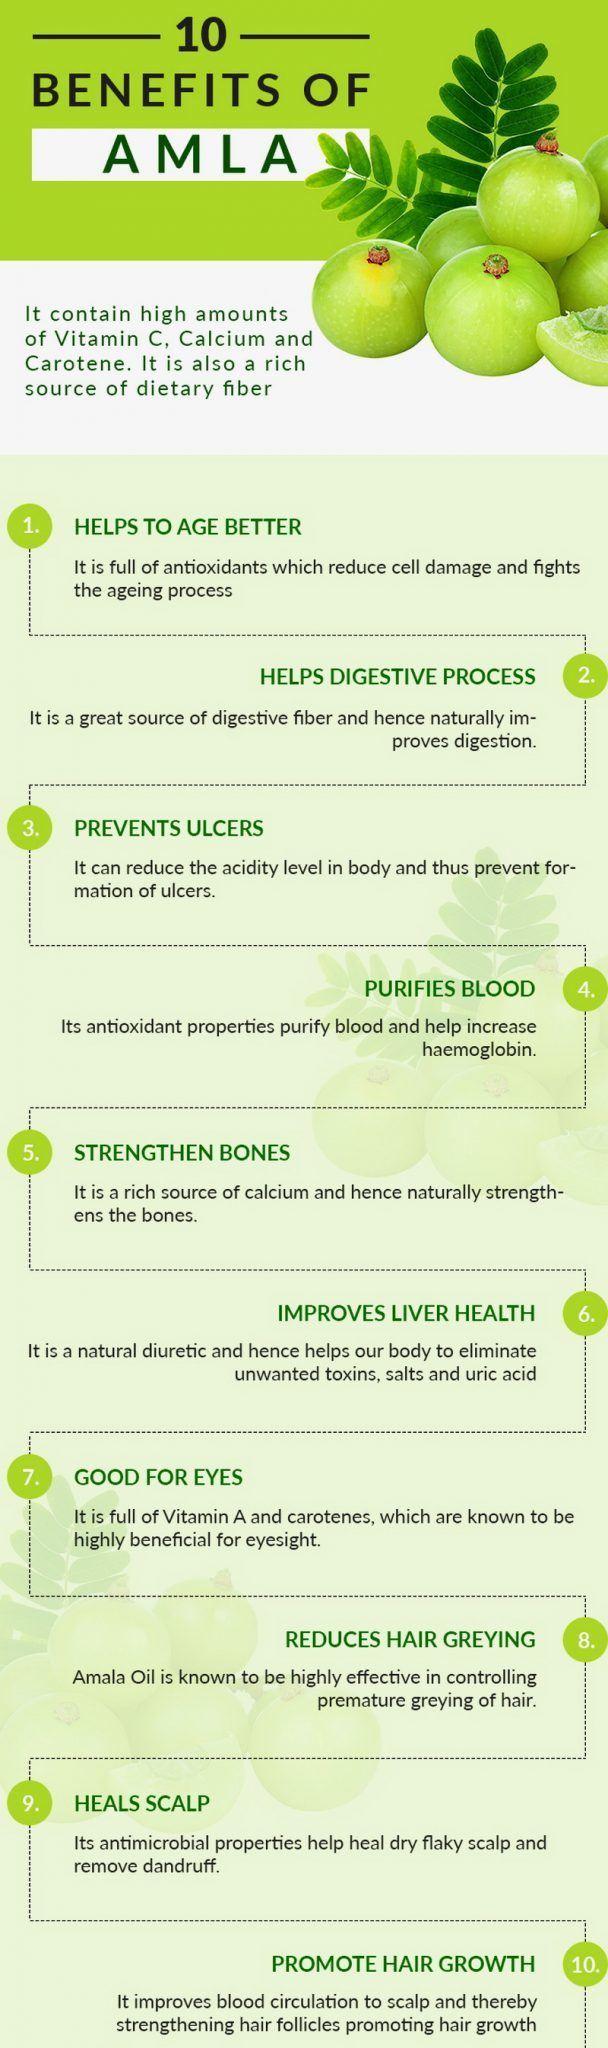 Best 8 Benefits of Indian Gooseberries According to Research Studies